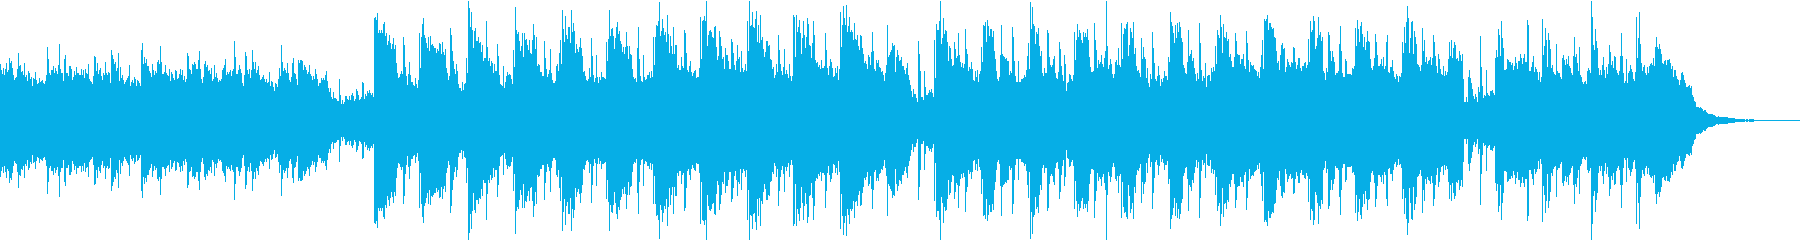 Pf「夜」和風現代ジャズの再生済みの波形